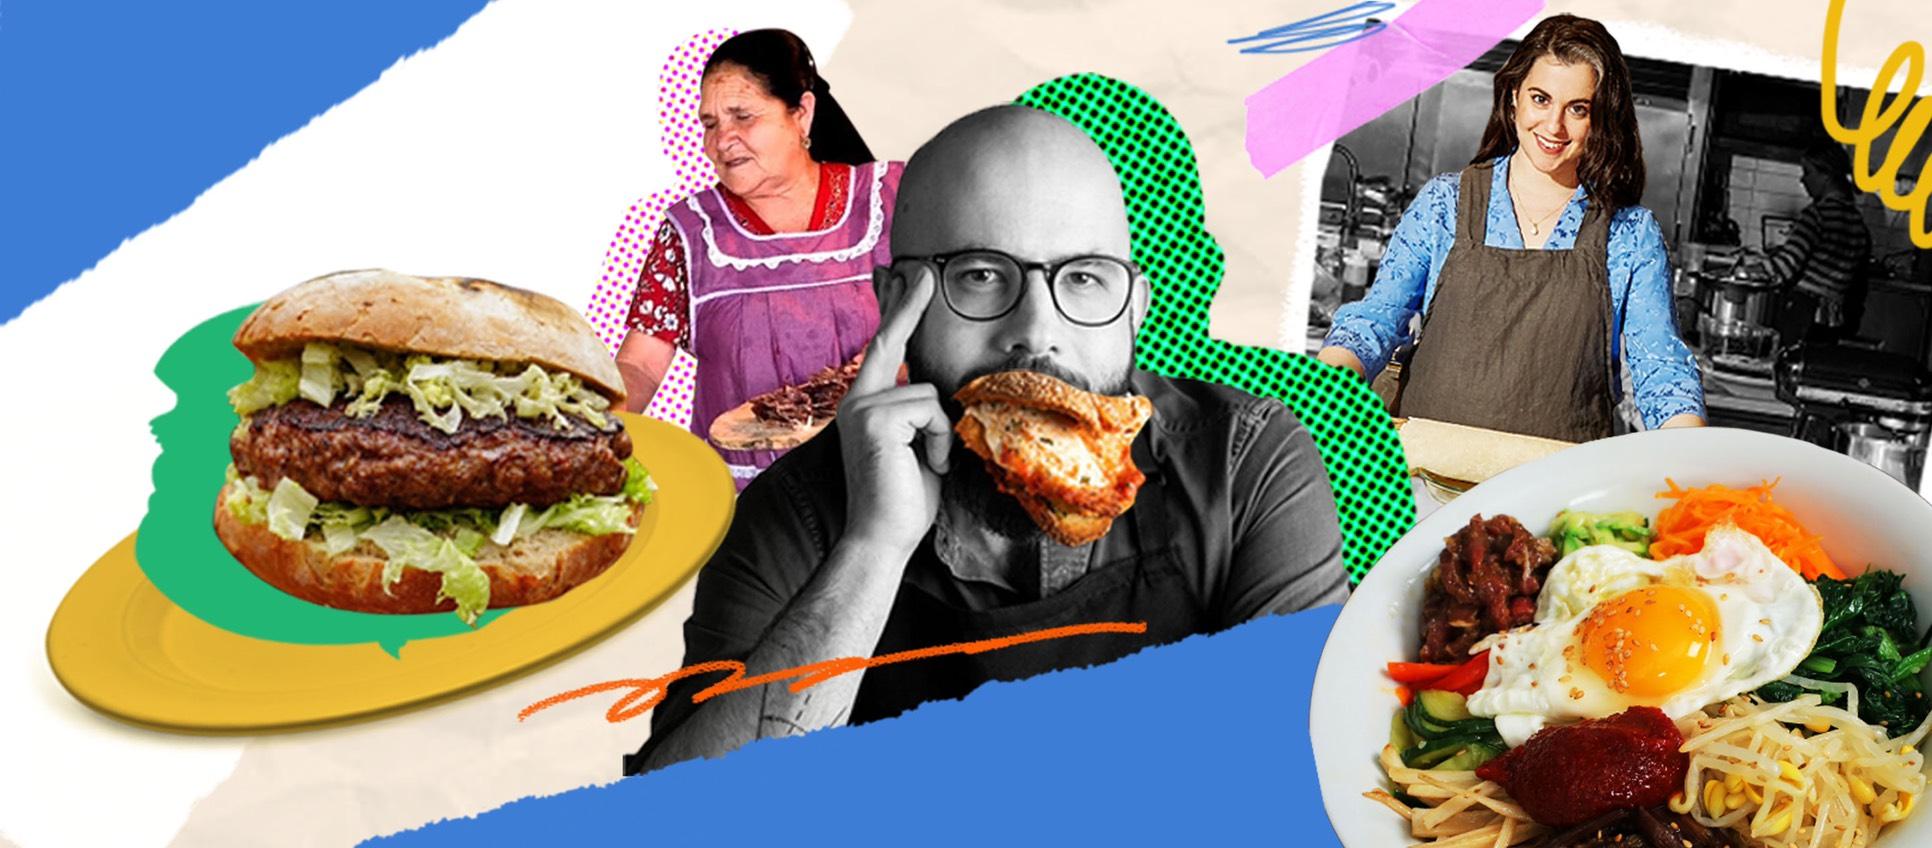 The Healing Kitchen อิ่มท้อง อุ่นใจ กับ 5 แชนแนลทำอาหารที่เราชวน binge-watch ช่วงกักตัว